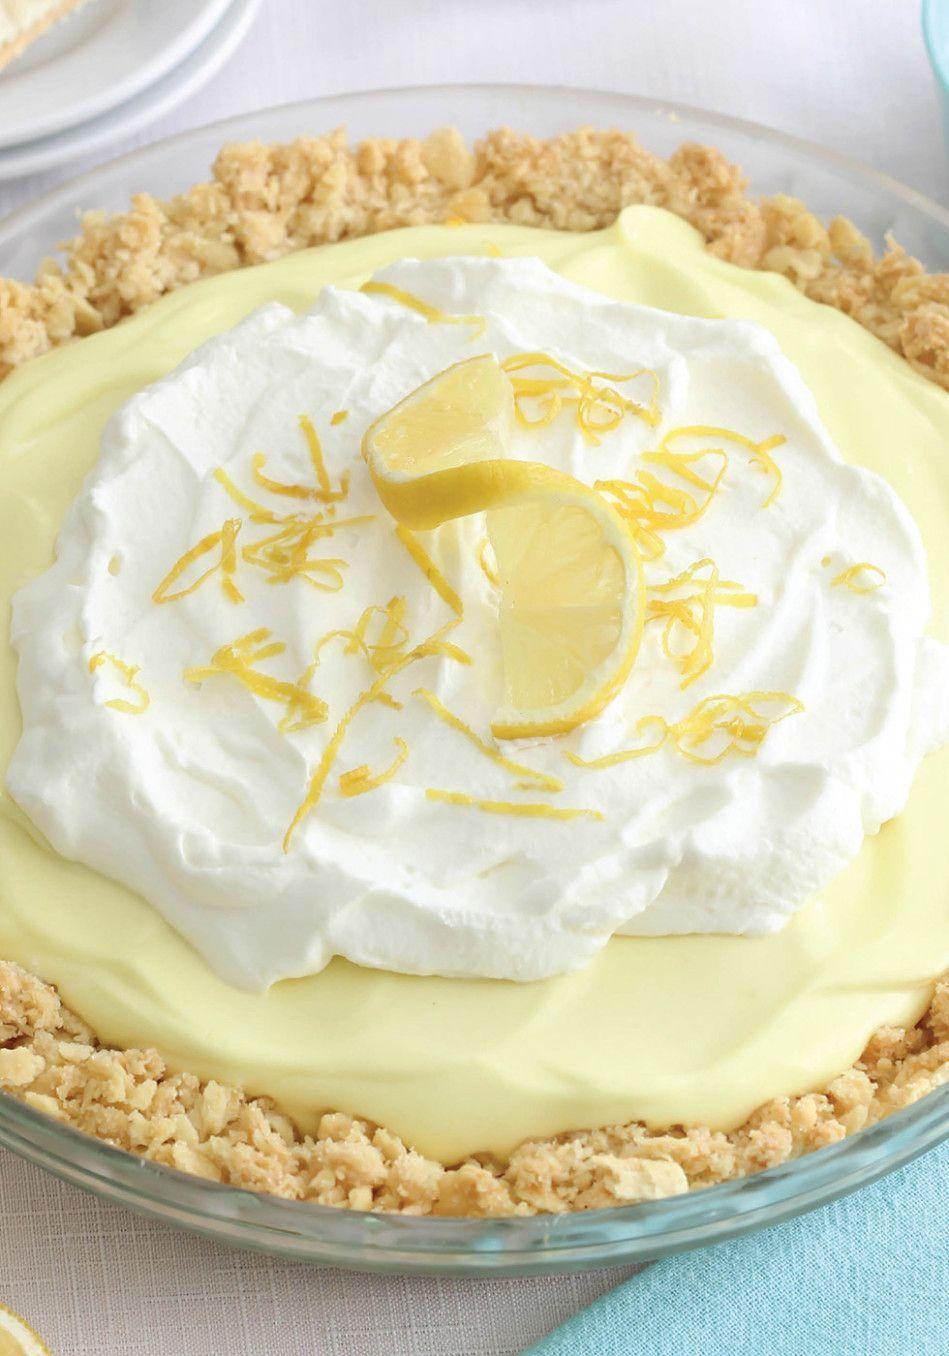 Lemon Pie with Soda-Cracker Crust Recipe pies Lemon Pie with Soda-Cracker Crust Recipe